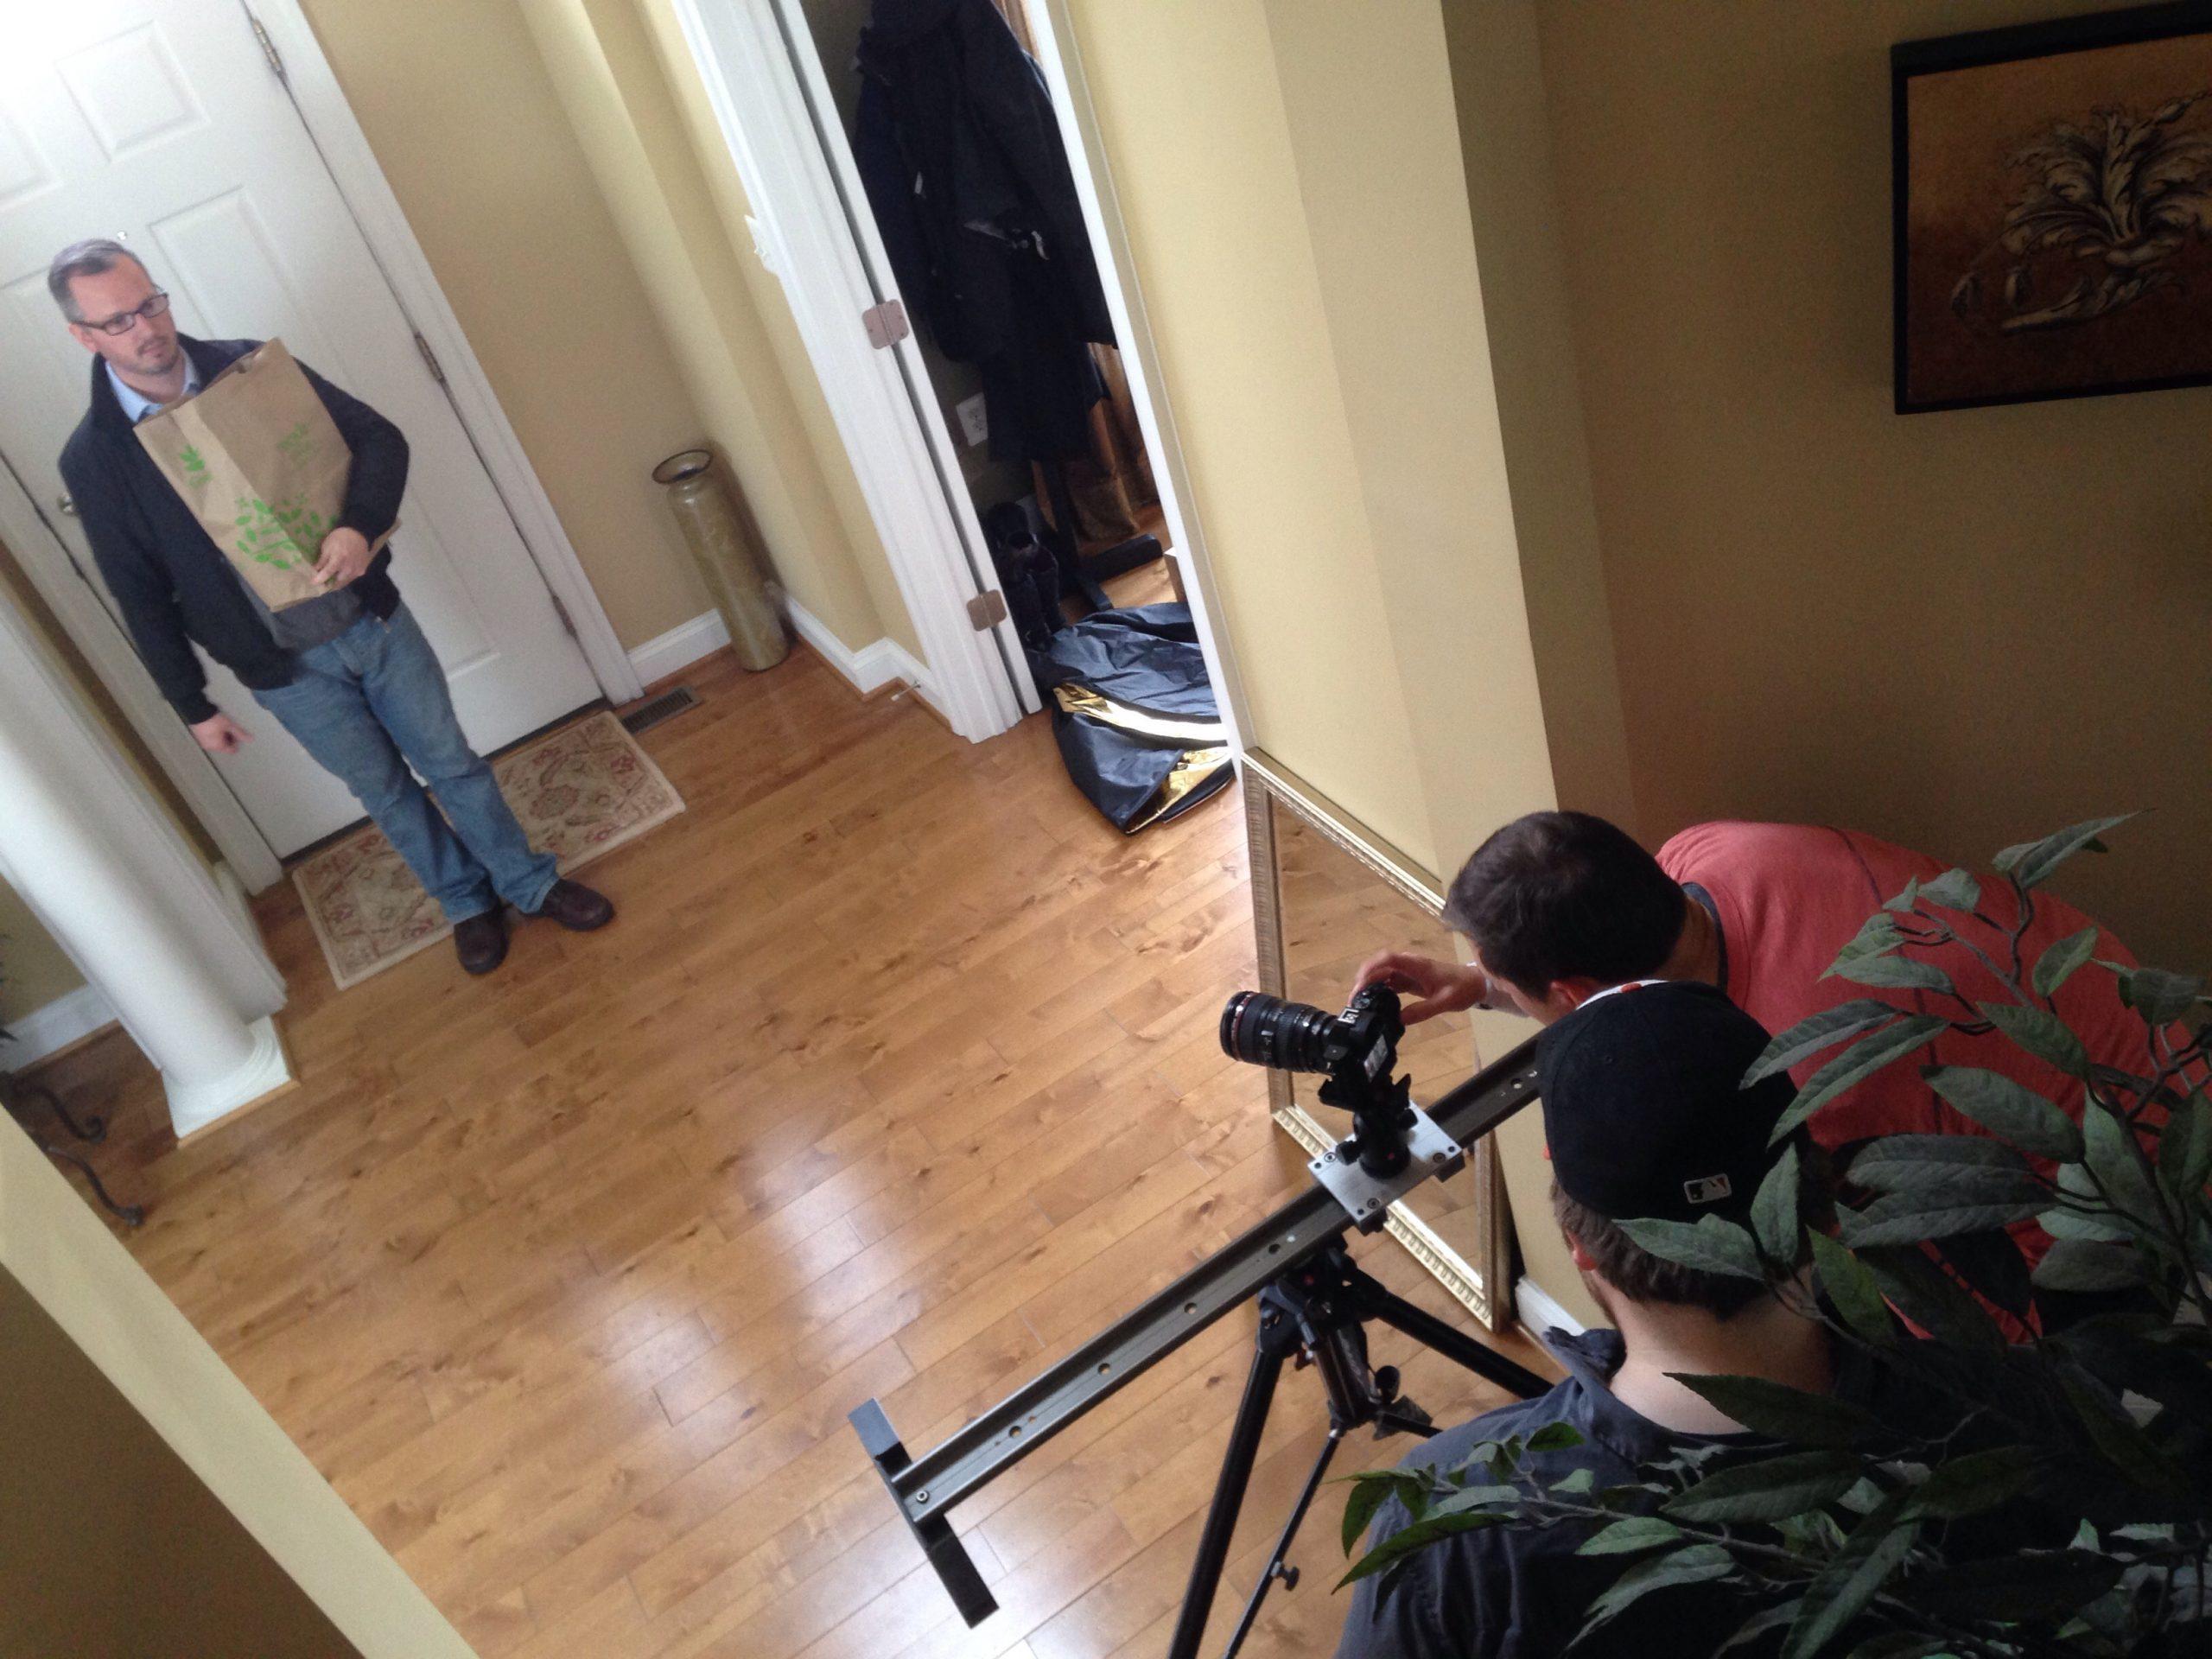 cameramen recording scenes for eyewear shoot